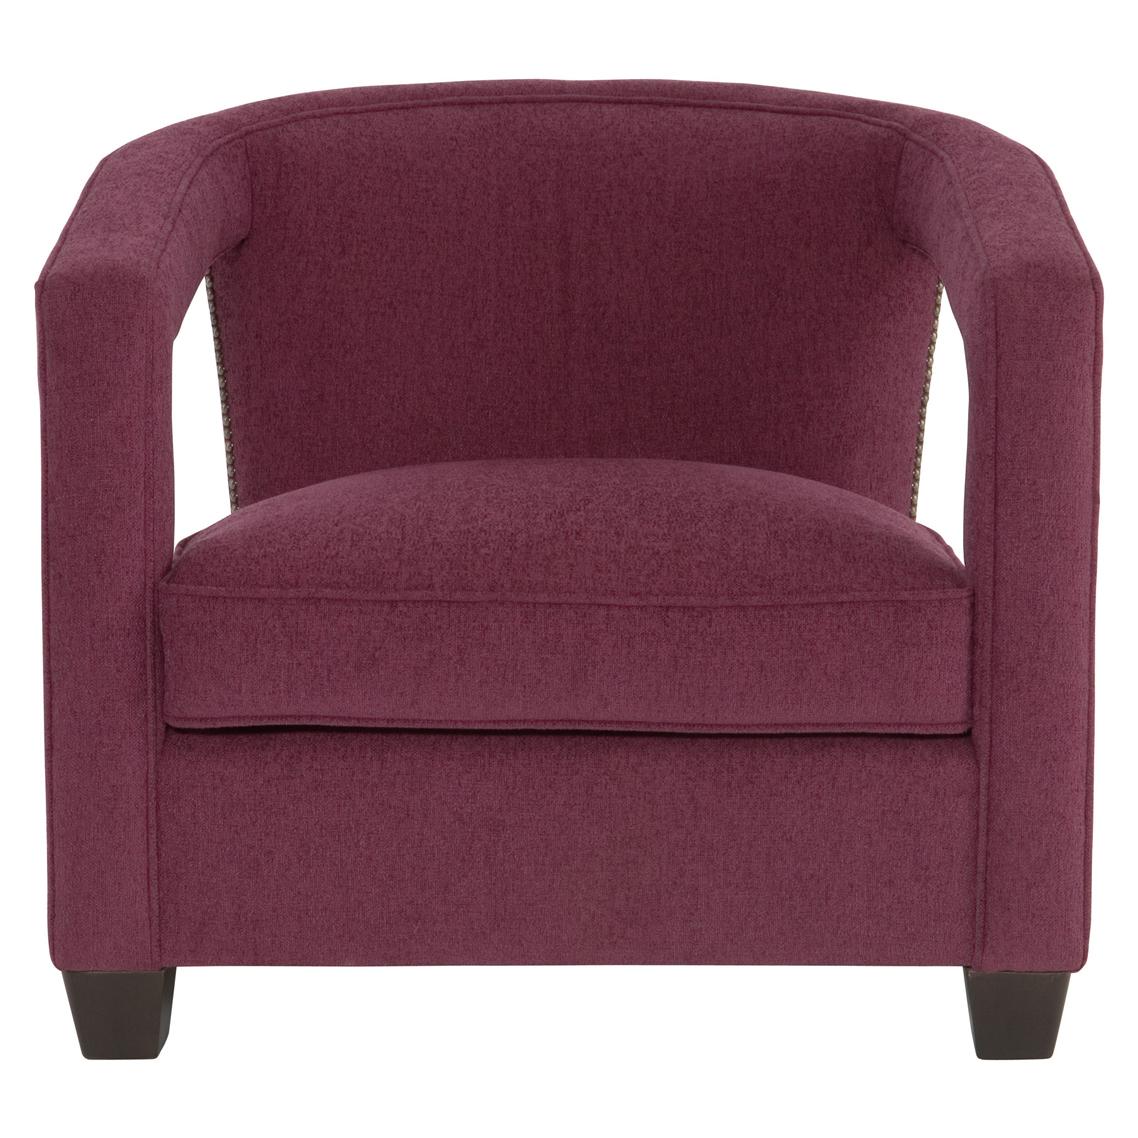 Rhea Hollywood Regency Bright Nickel Nailhead Purple Armchair